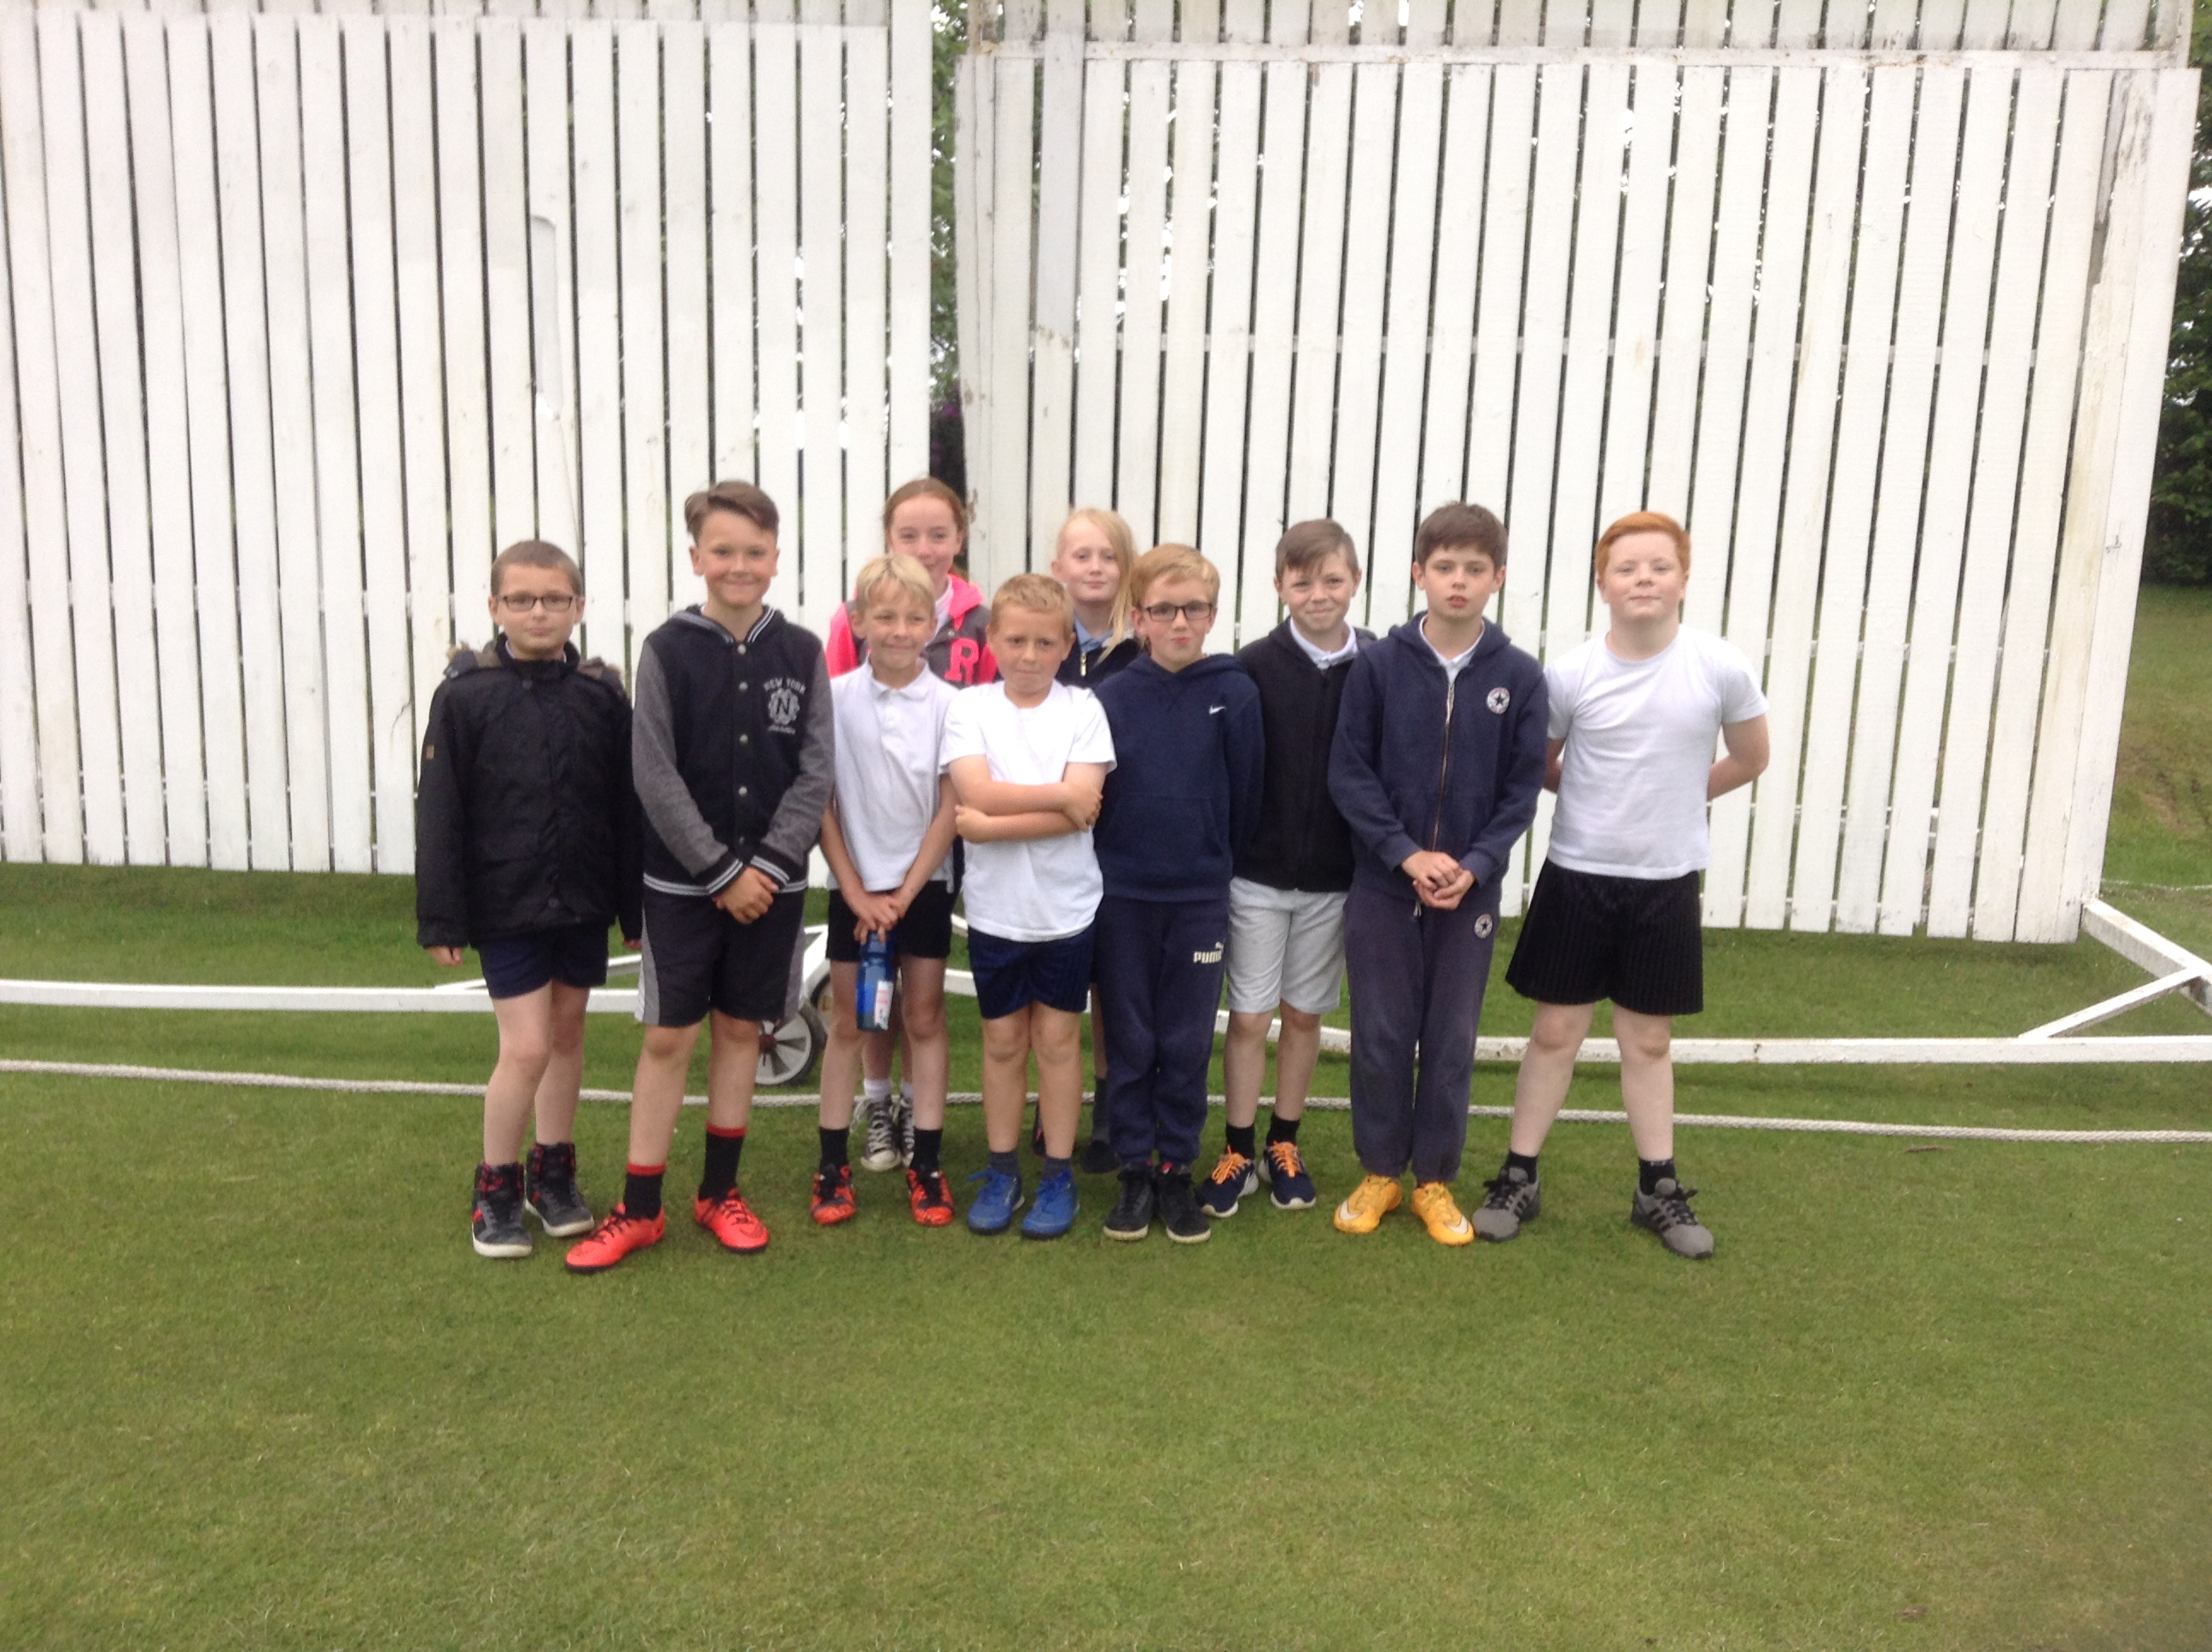 Police Sports Club cricket team